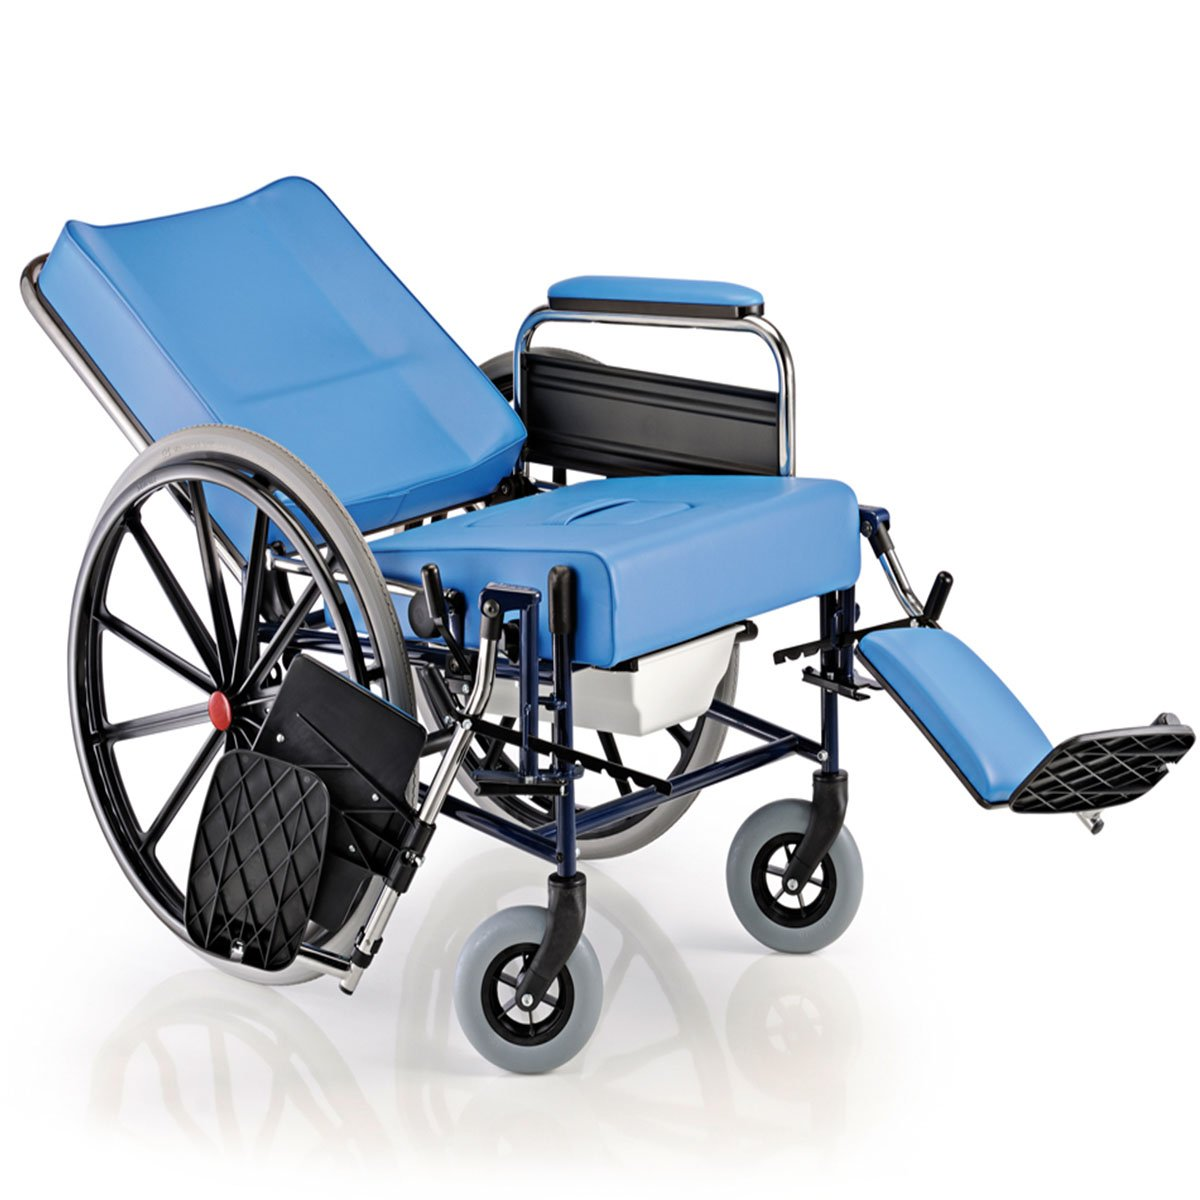 Noleggio sedie a rotelle con Wc Torino | Medinolrent